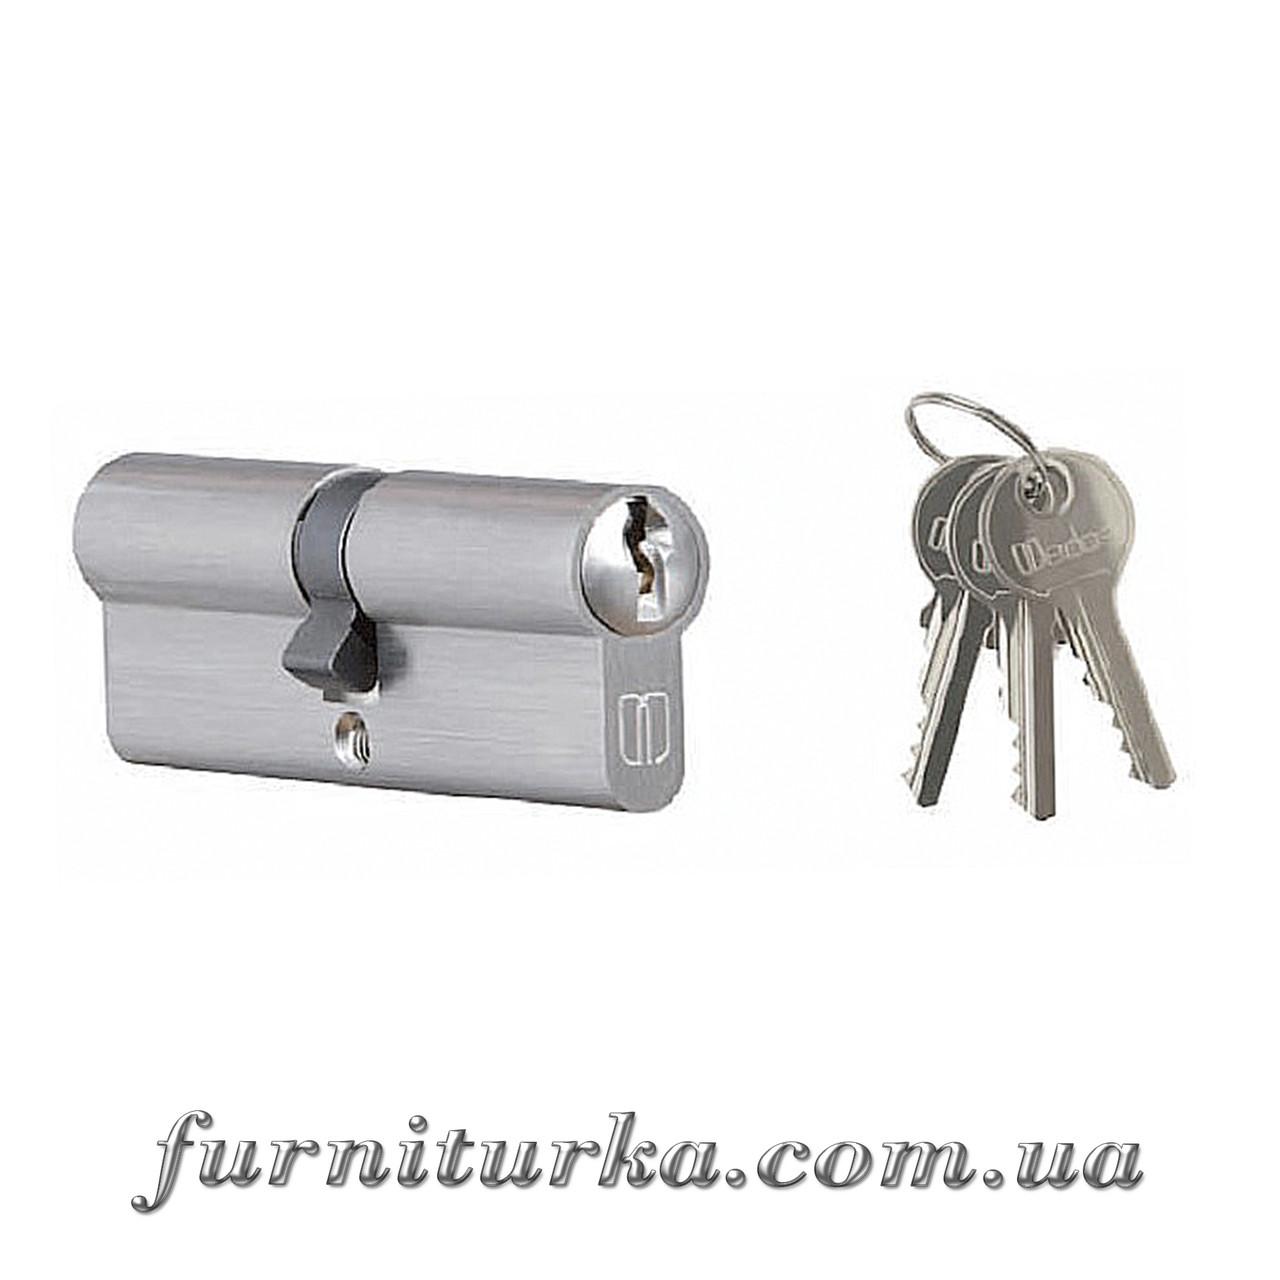 Сердцевина Medos 40/55 (ключ-ключ)